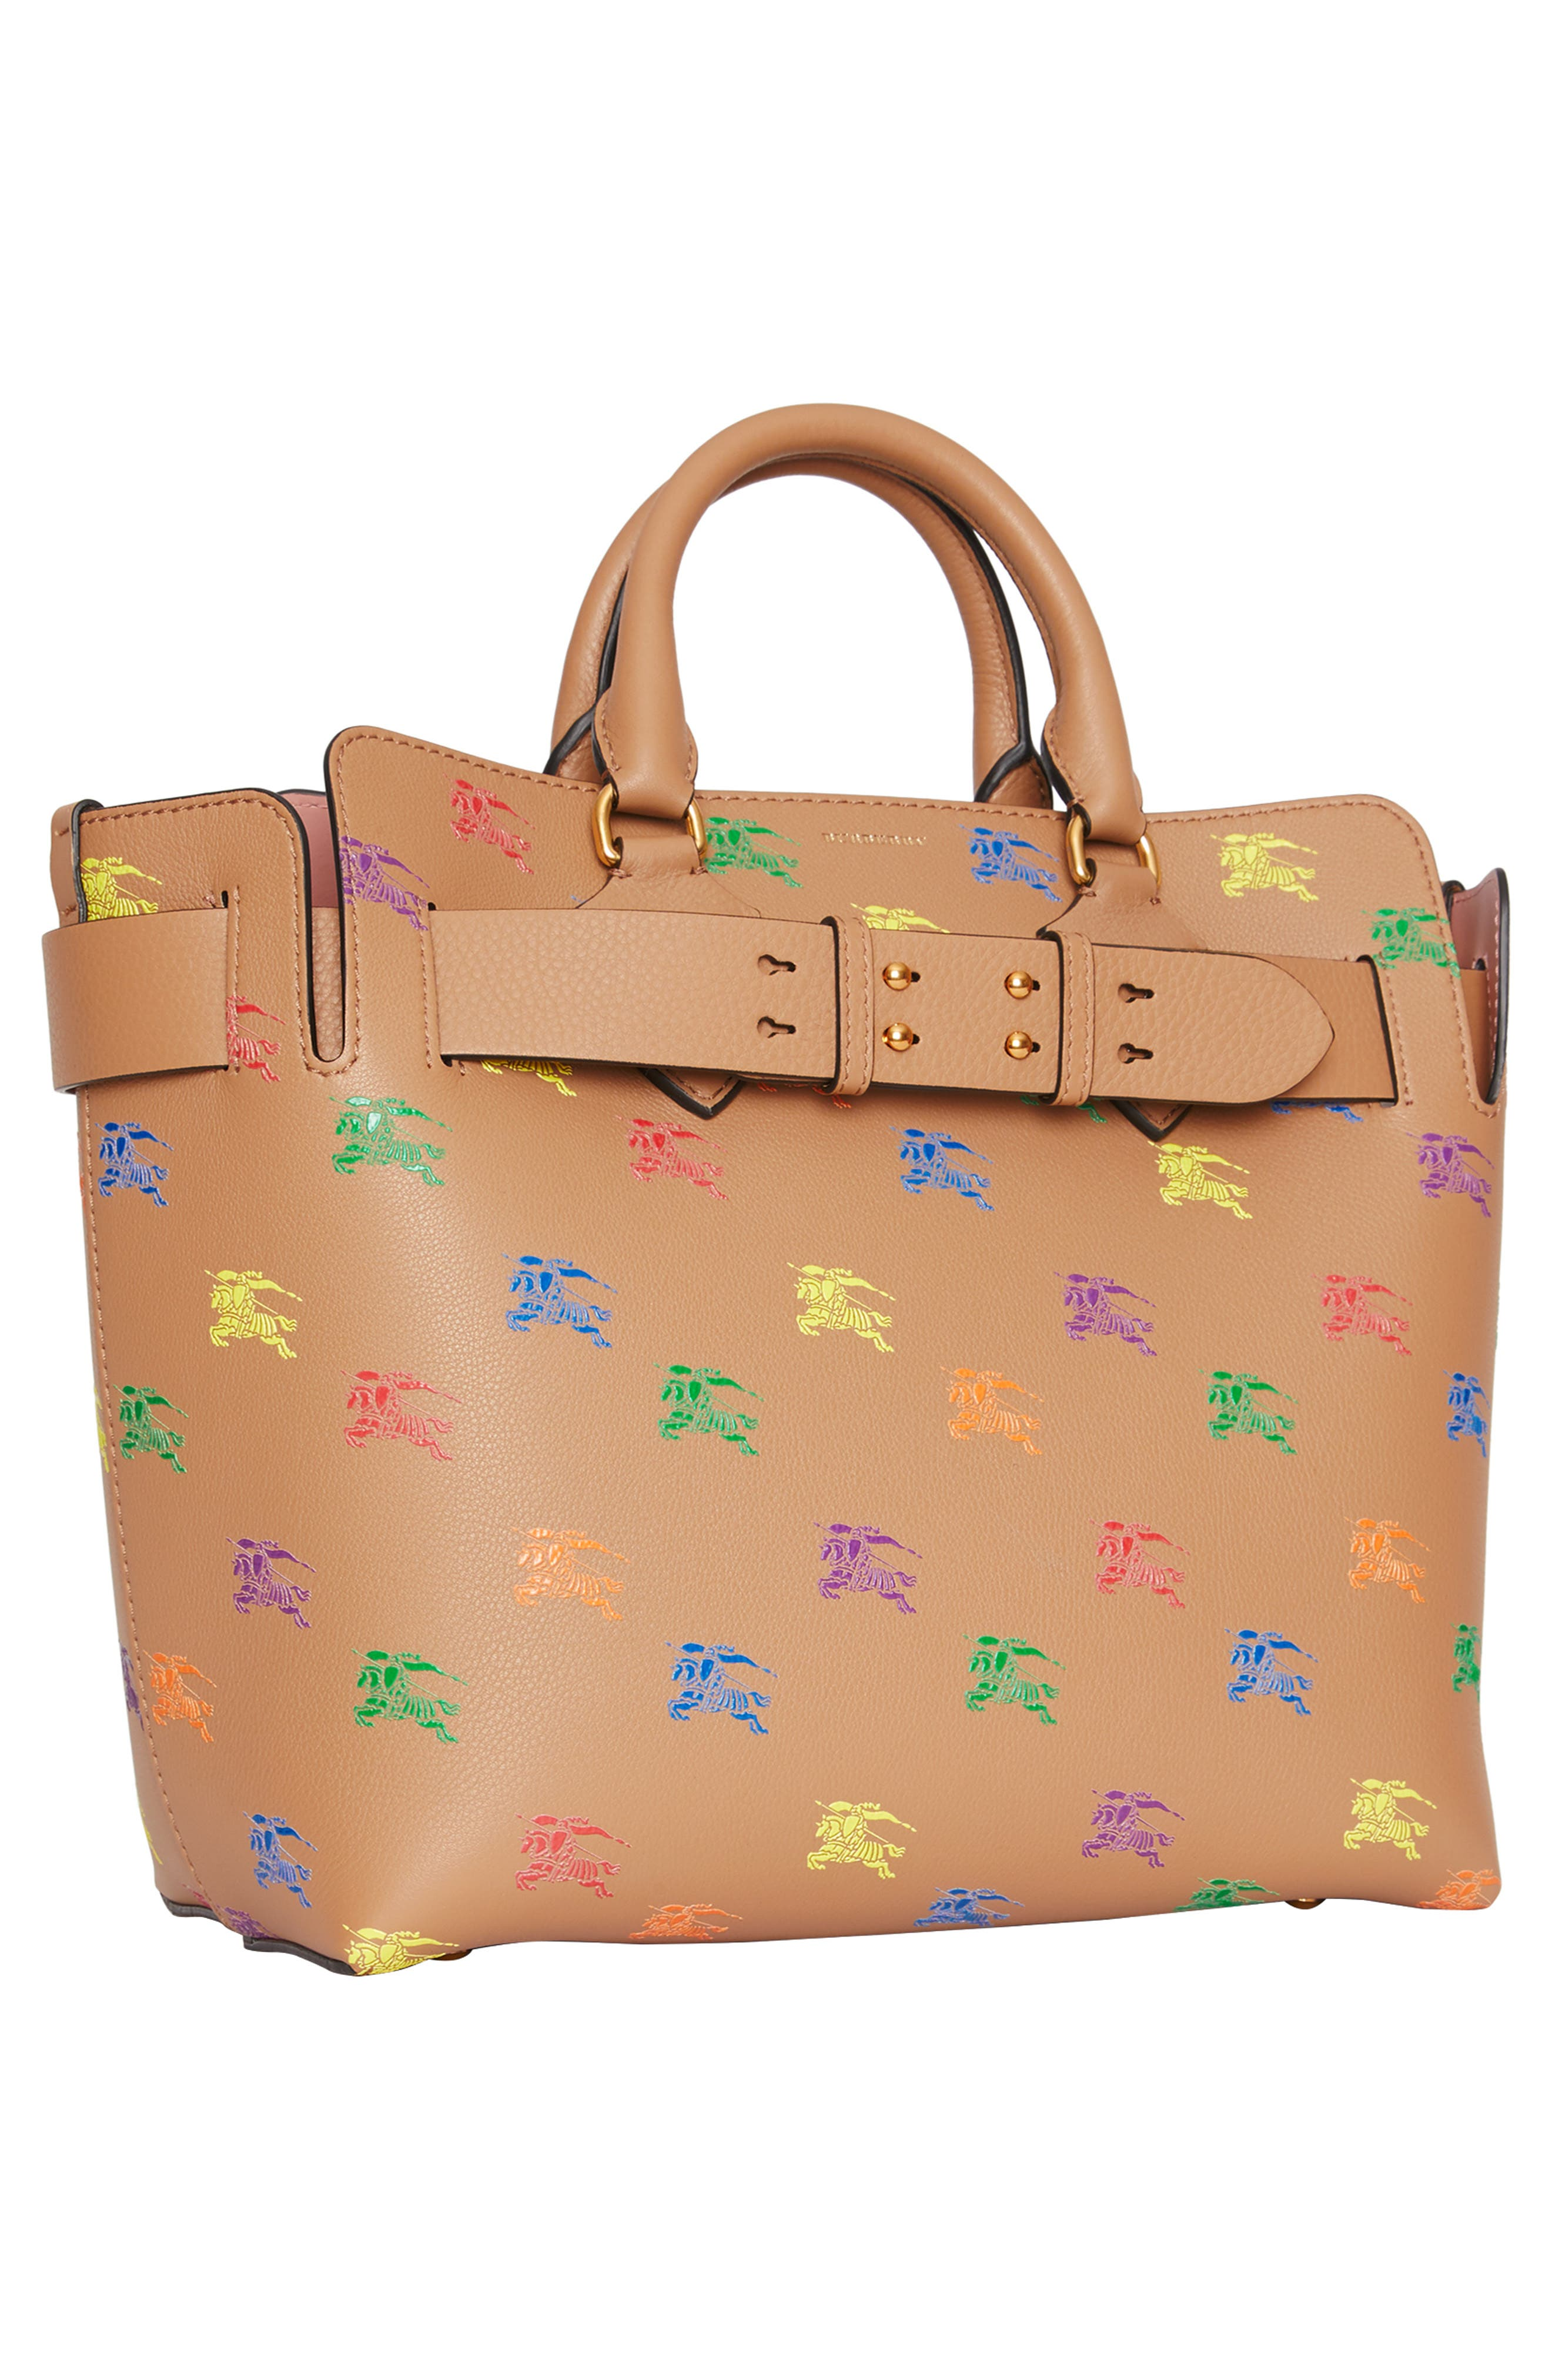 Baby Belt Bag Rainbow Logo Leather Tote,                             Alternate thumbnail 9, color,                             LIGHT CAMEL